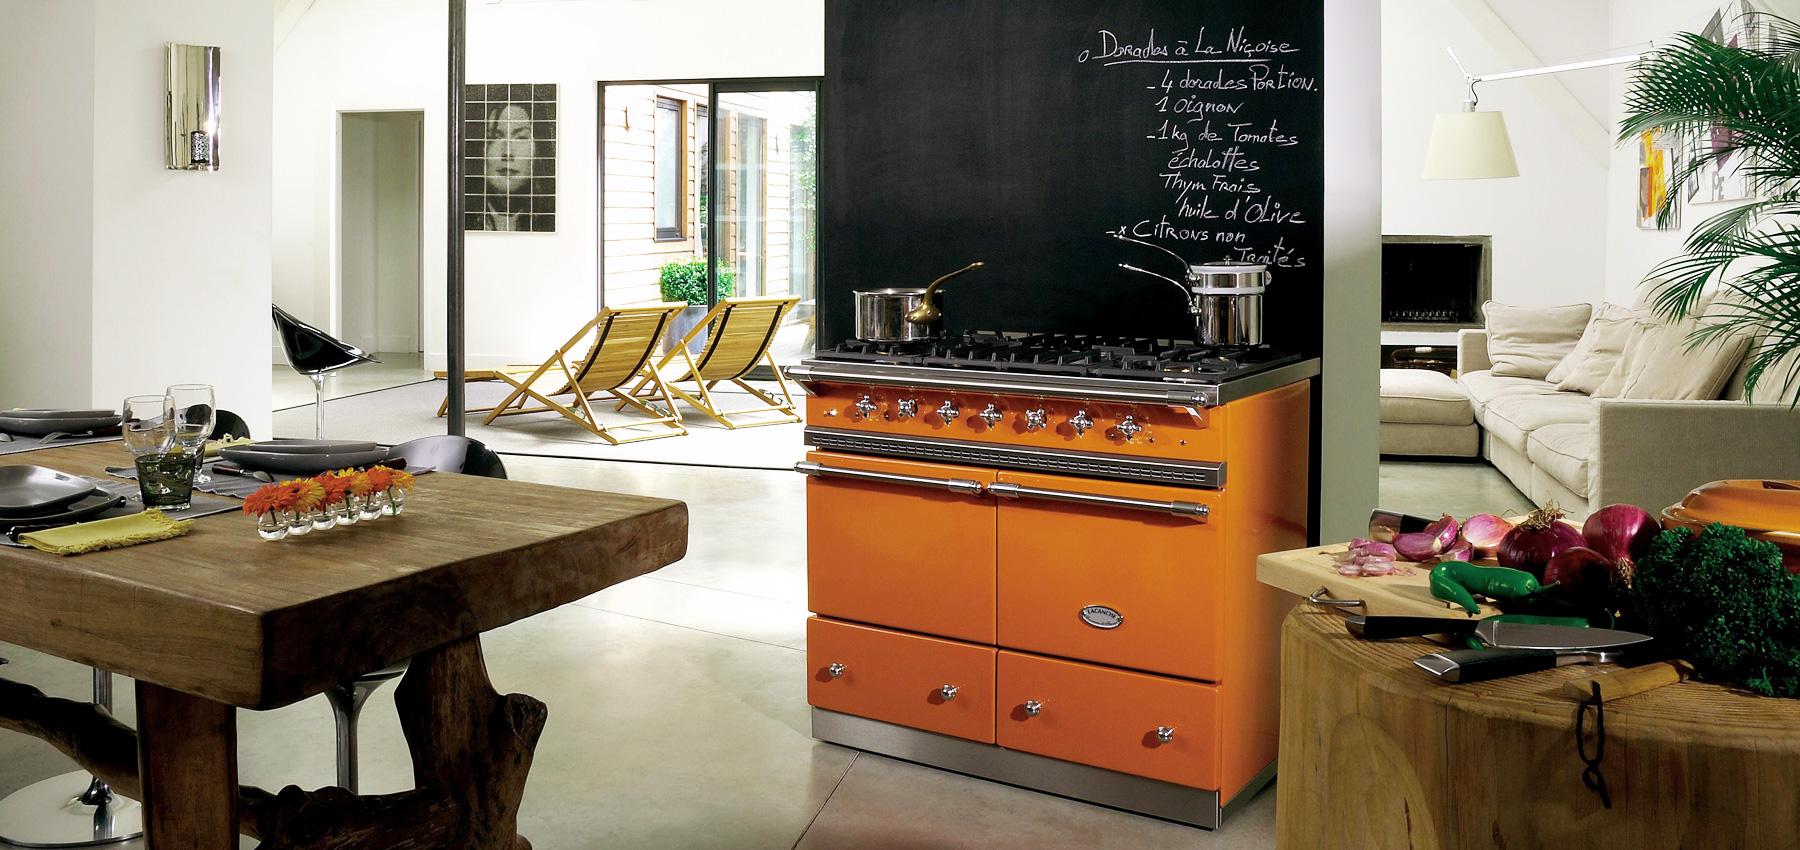 foto-range-cooker-01-lacanche-kochstation